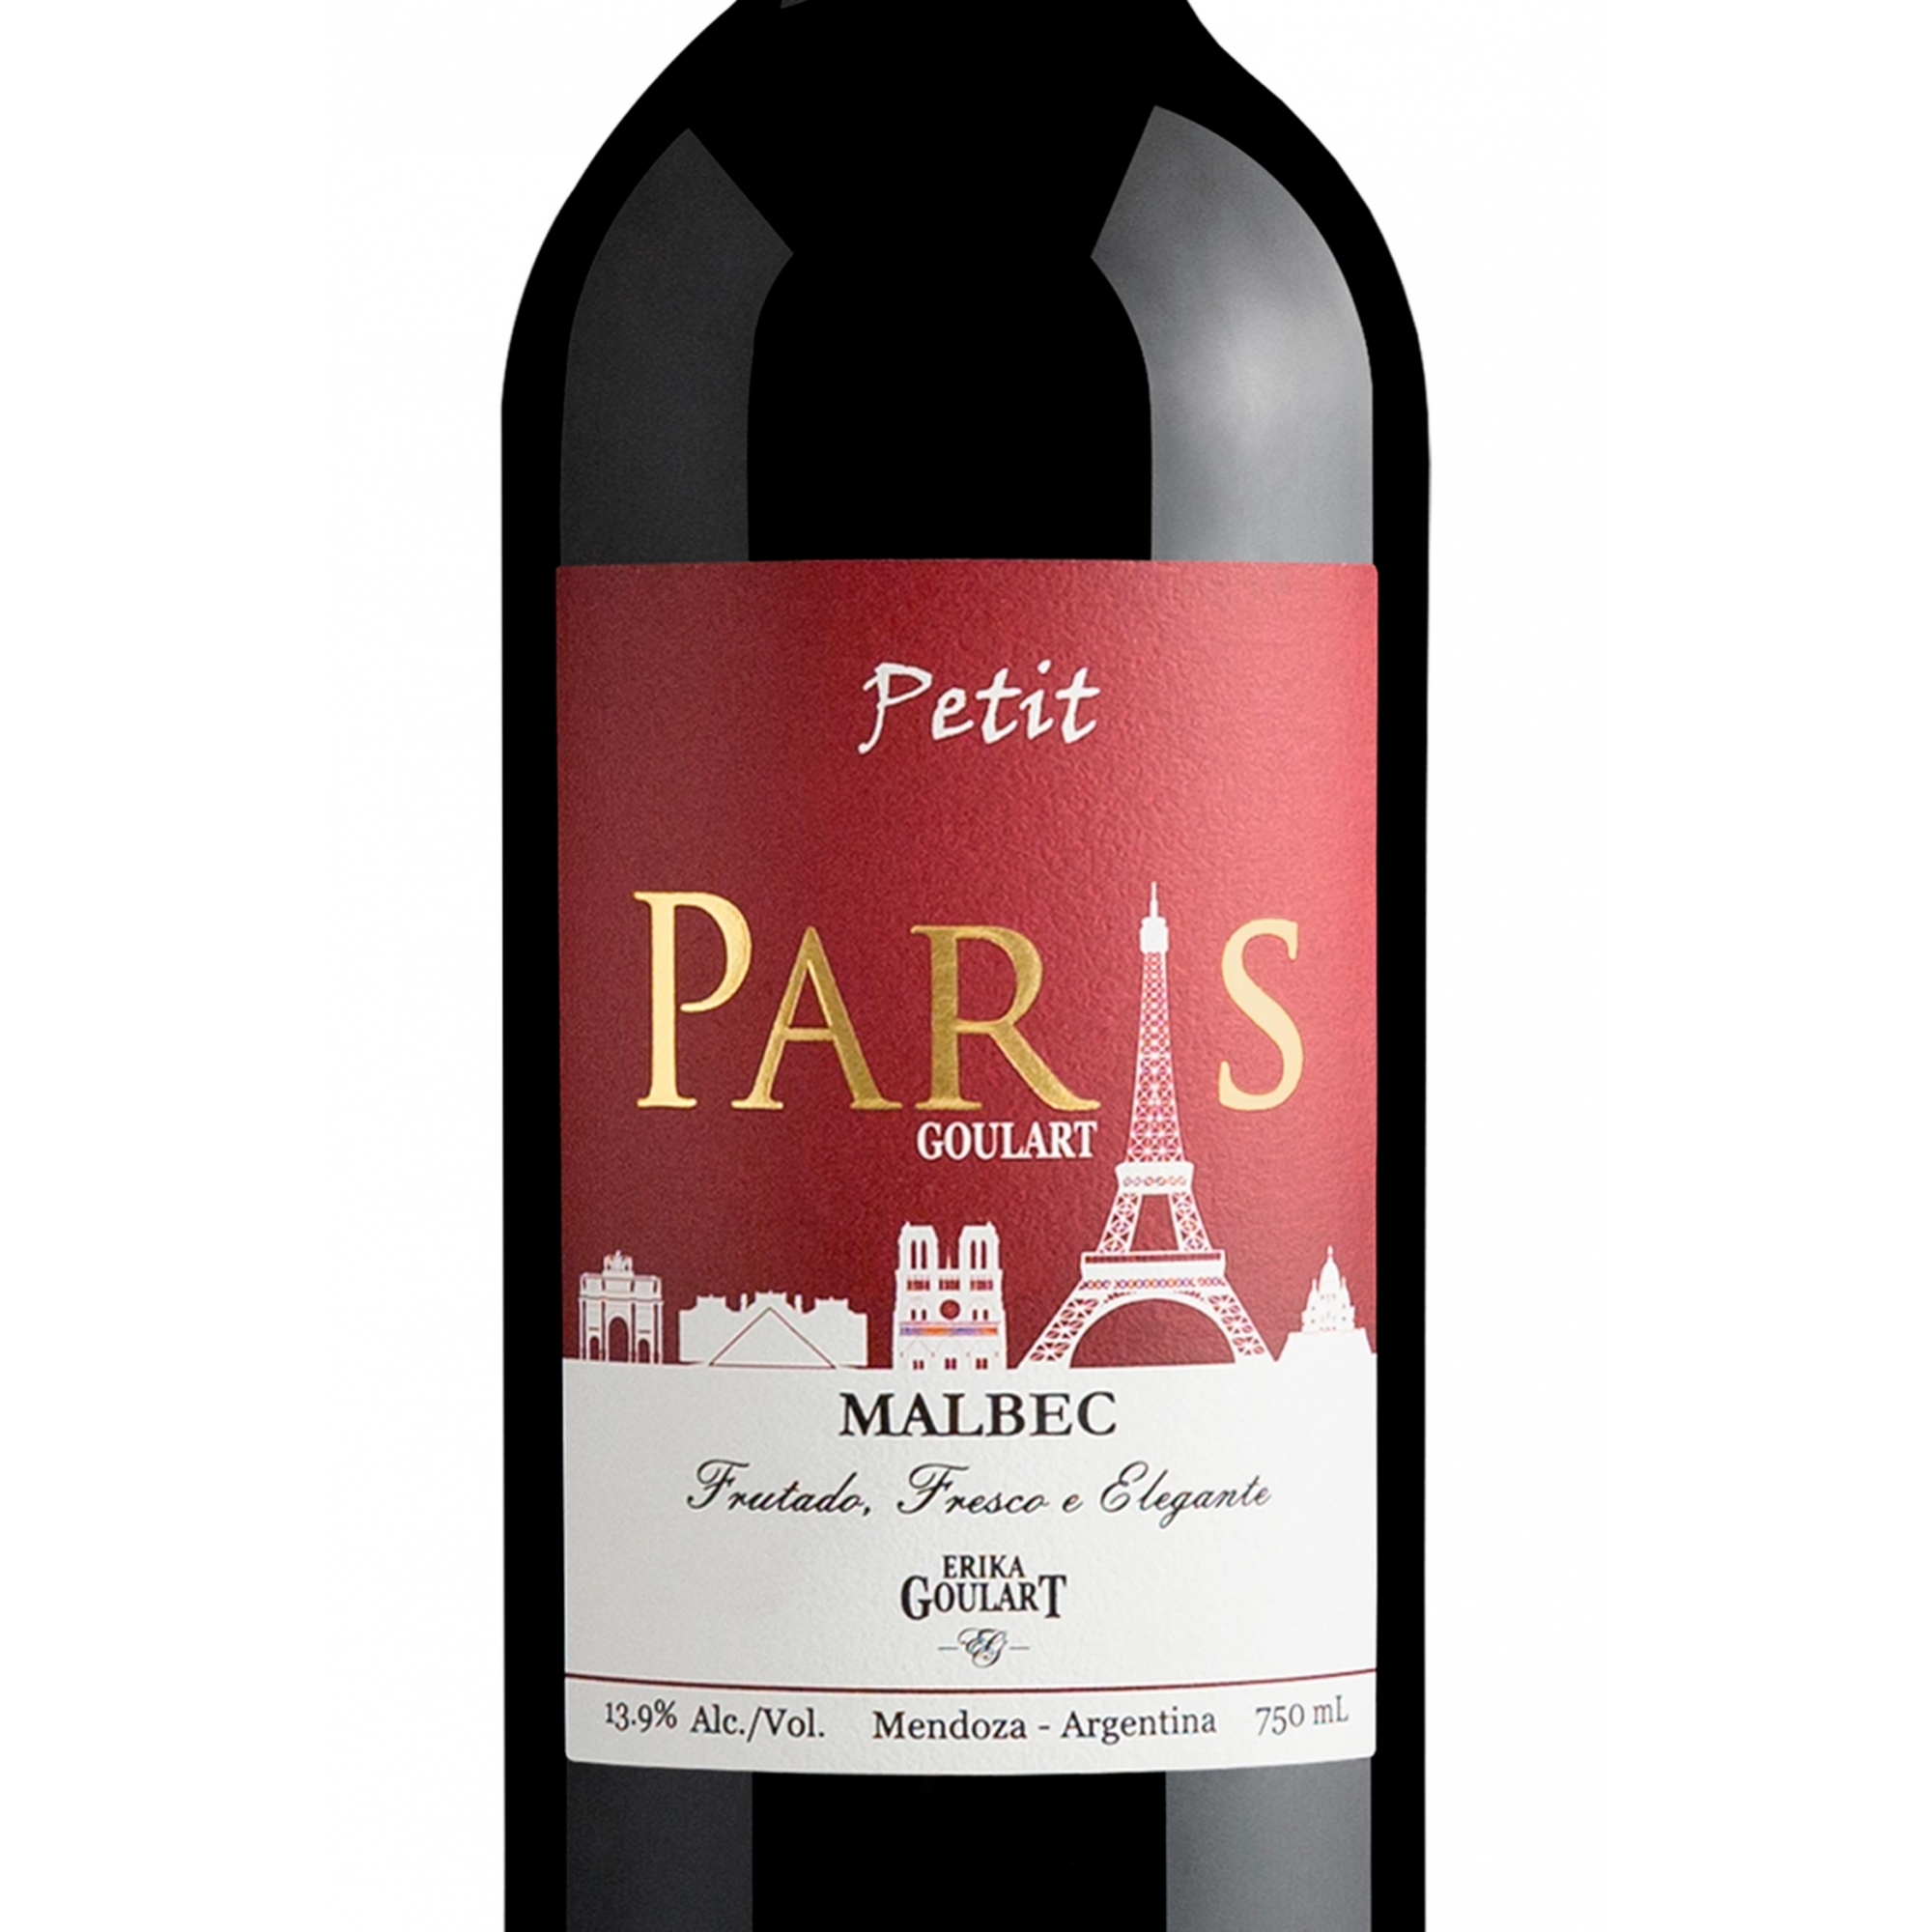 Petit Paris Goulart Malbec 2020 - 750ml